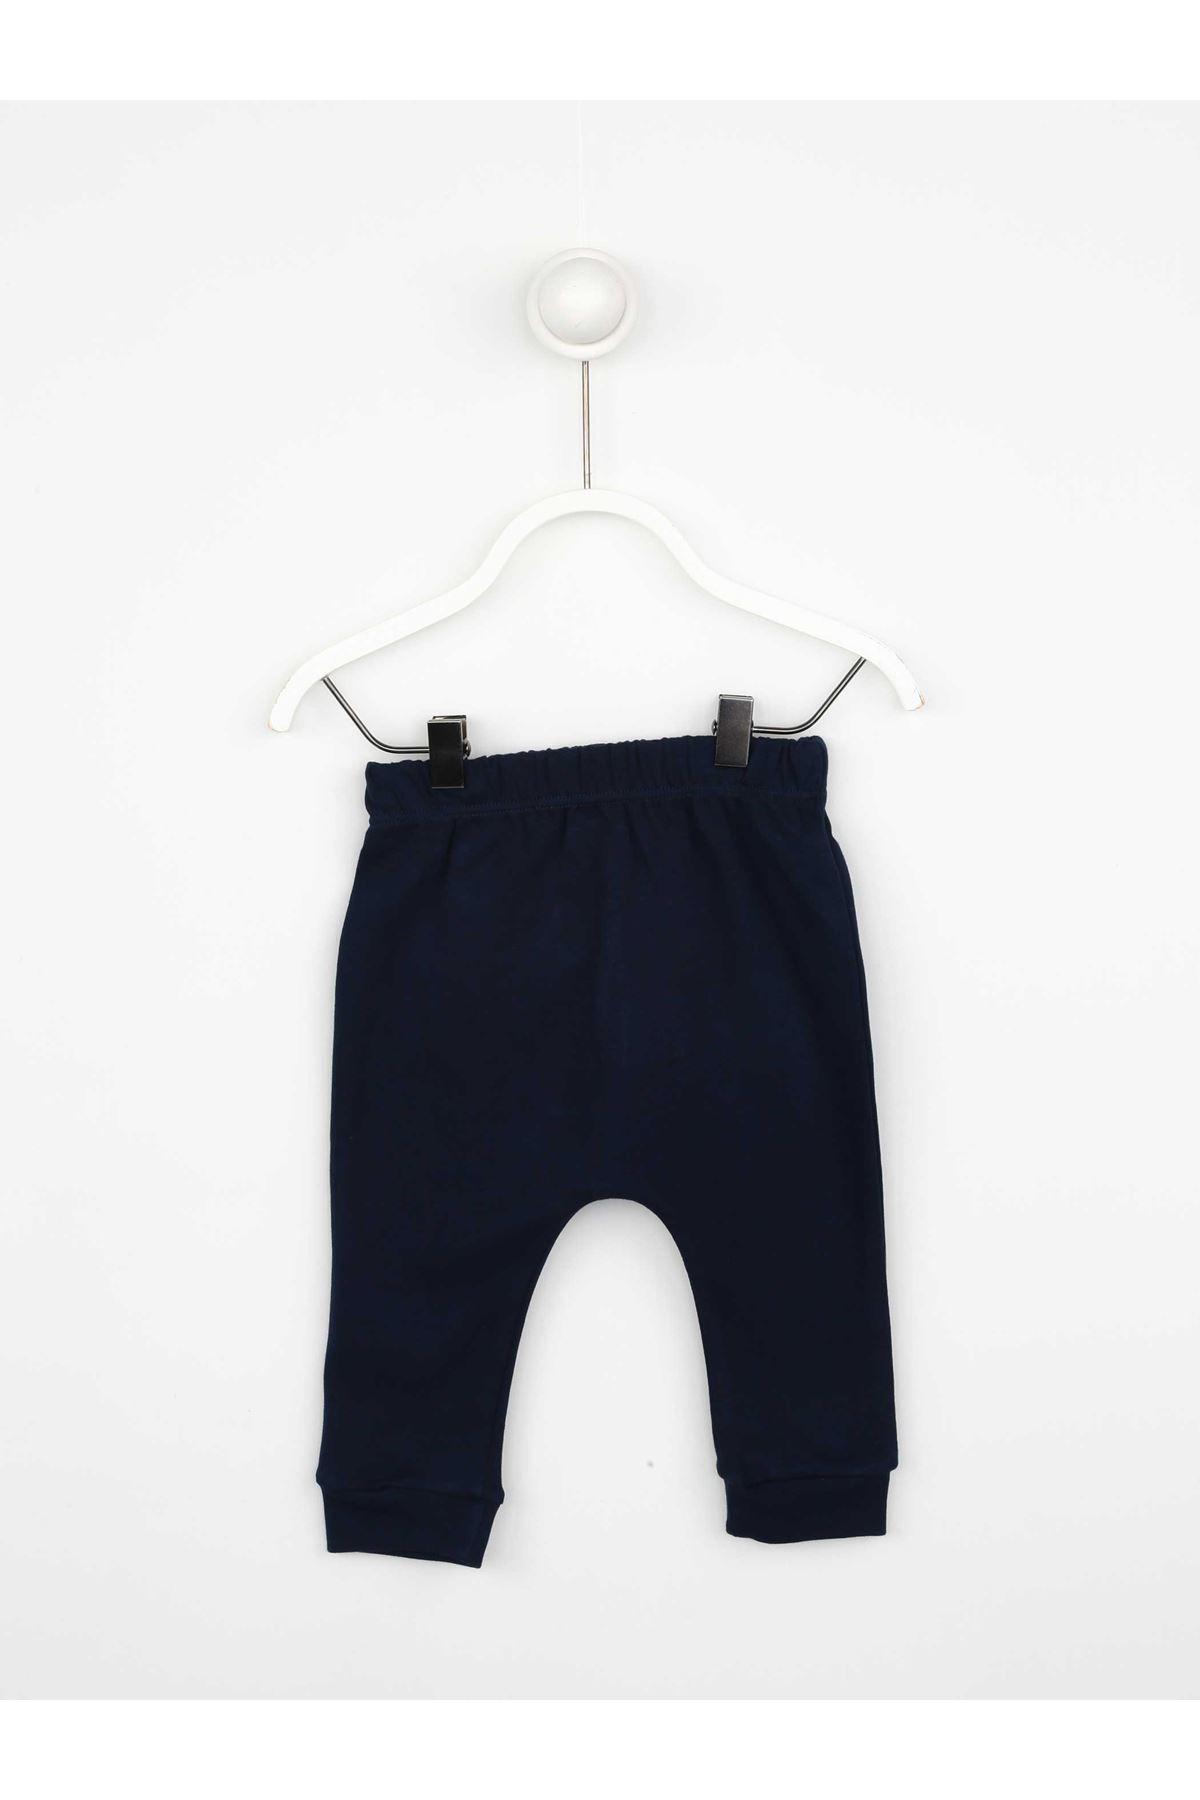 Navy blue Male Baby 3 Pcs Set